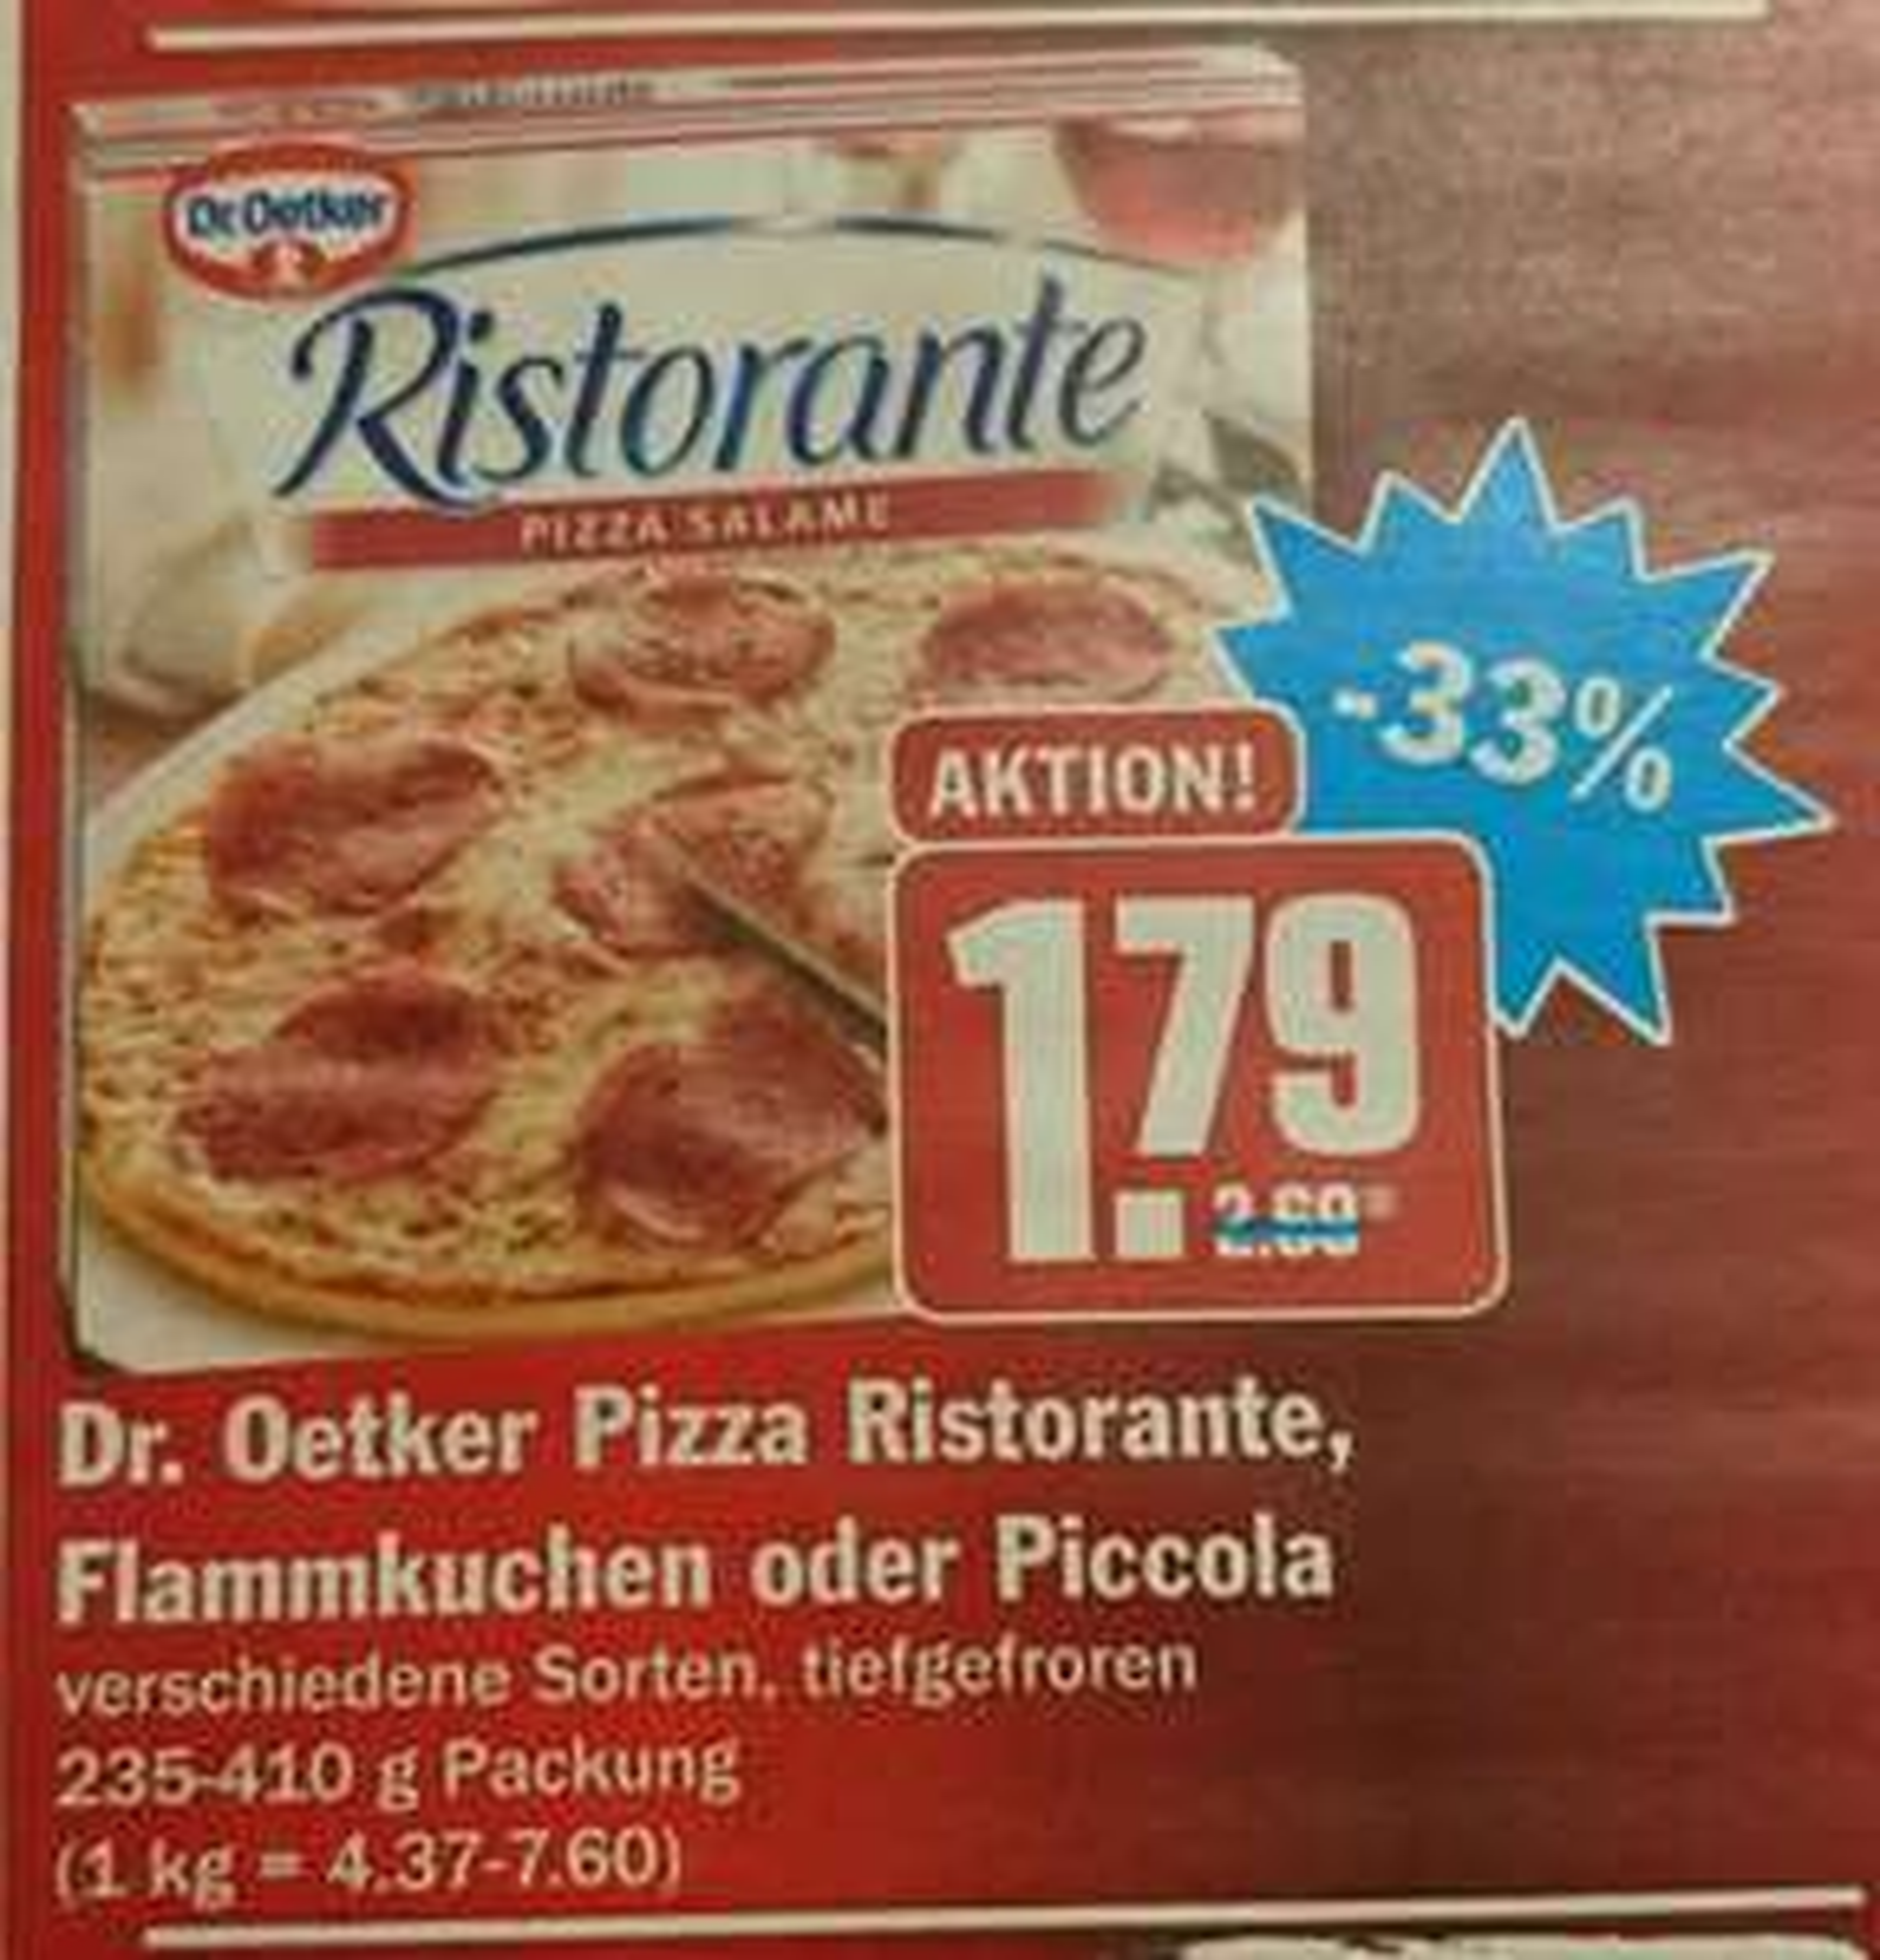 Dr. Oetker Pizza Ristorante / Flammkuchen / Piccola [Hit] [KW45 05. -10.11.]